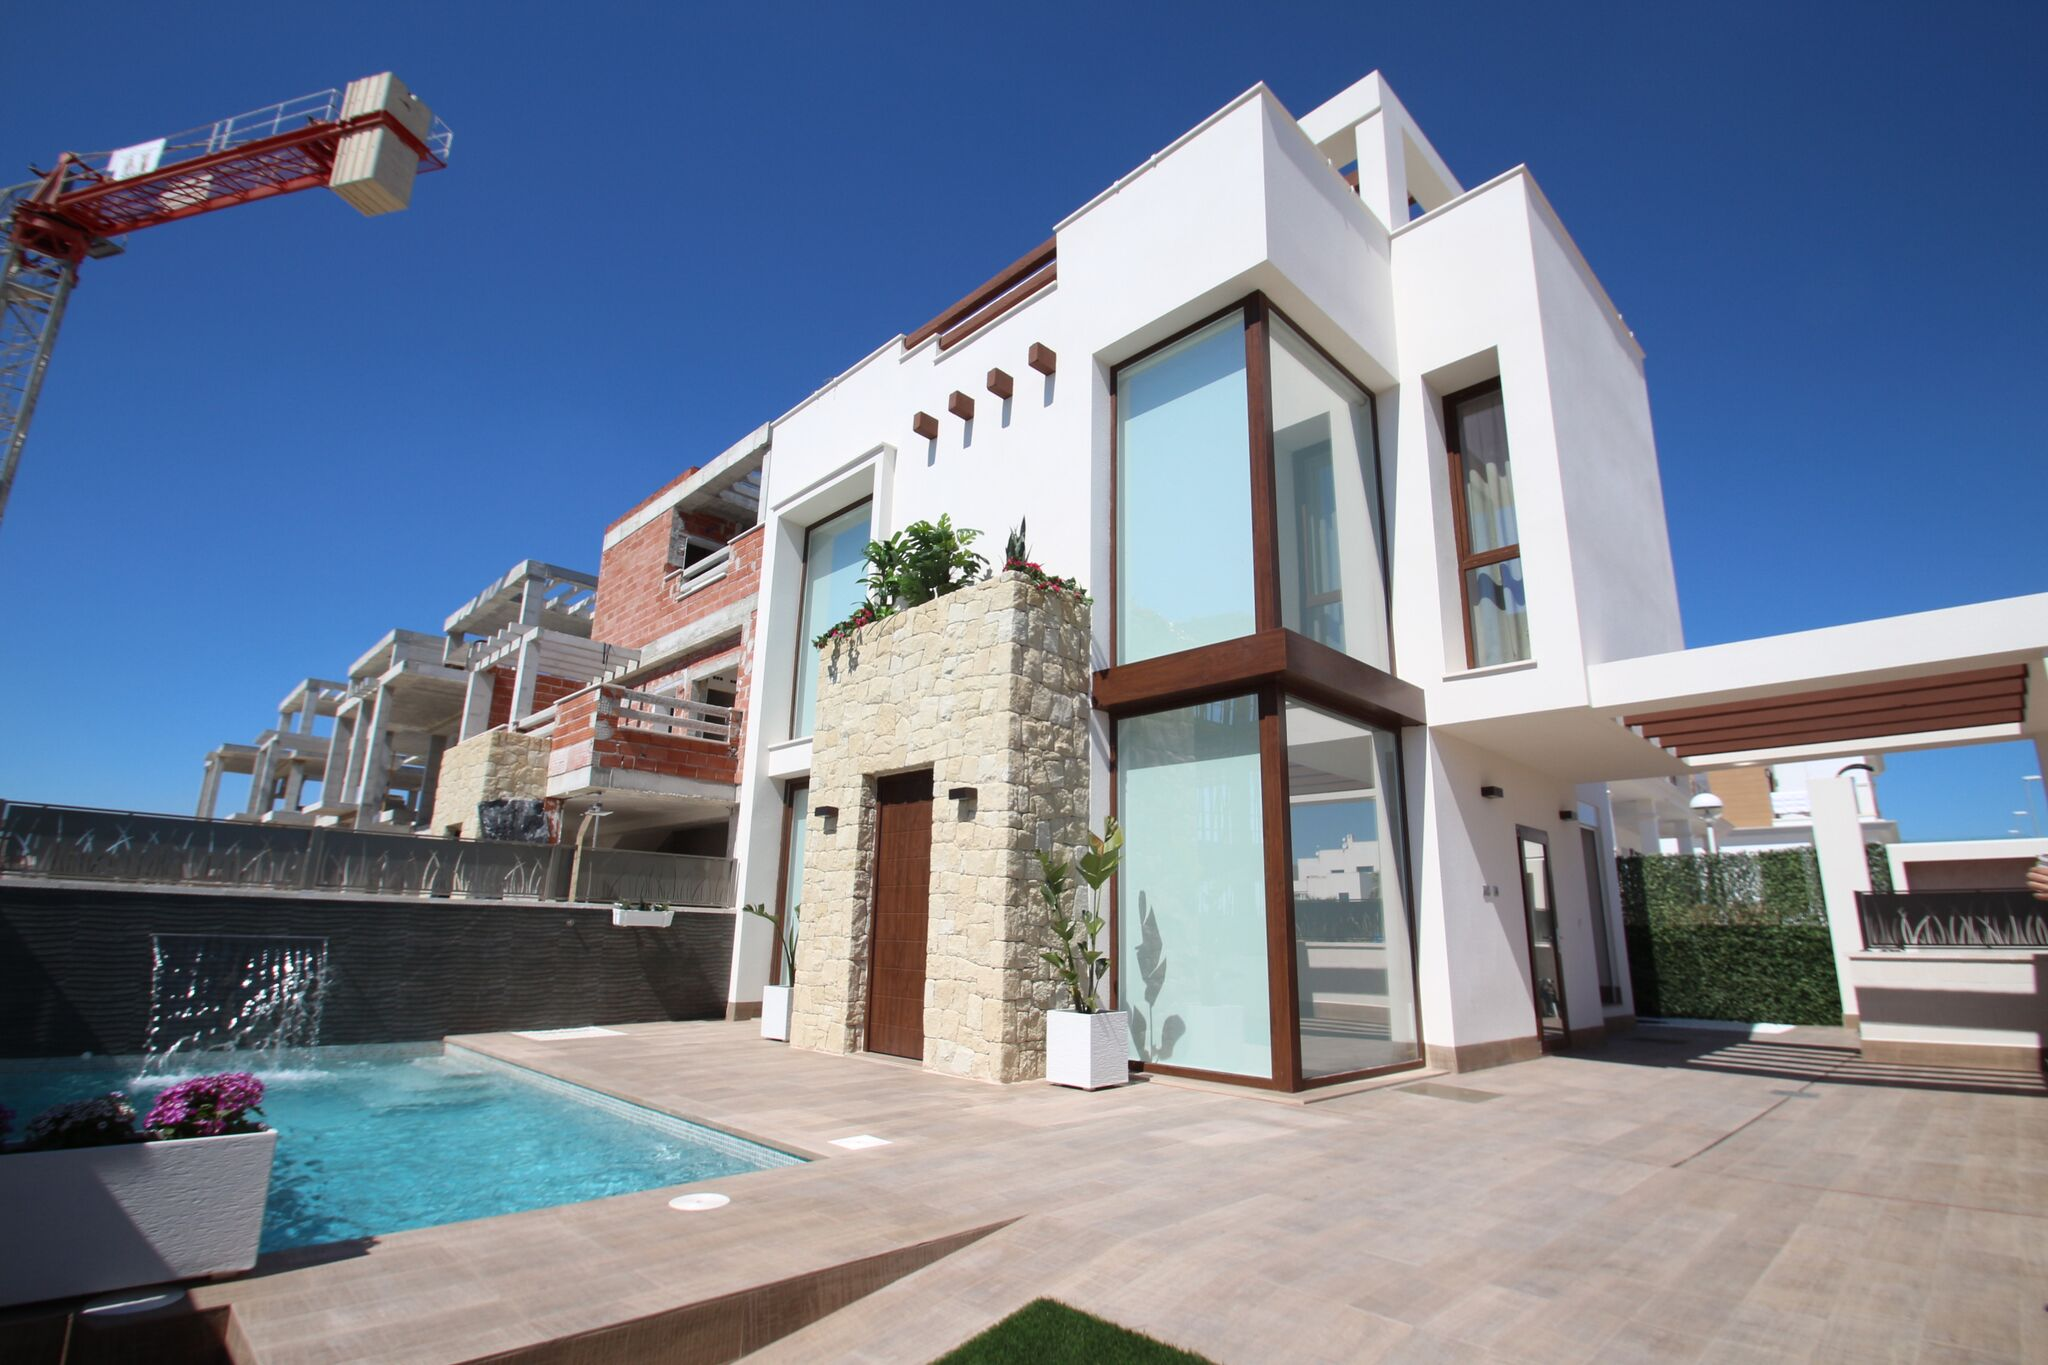 New Detached Luxury Villa in Guardamar Del Segura